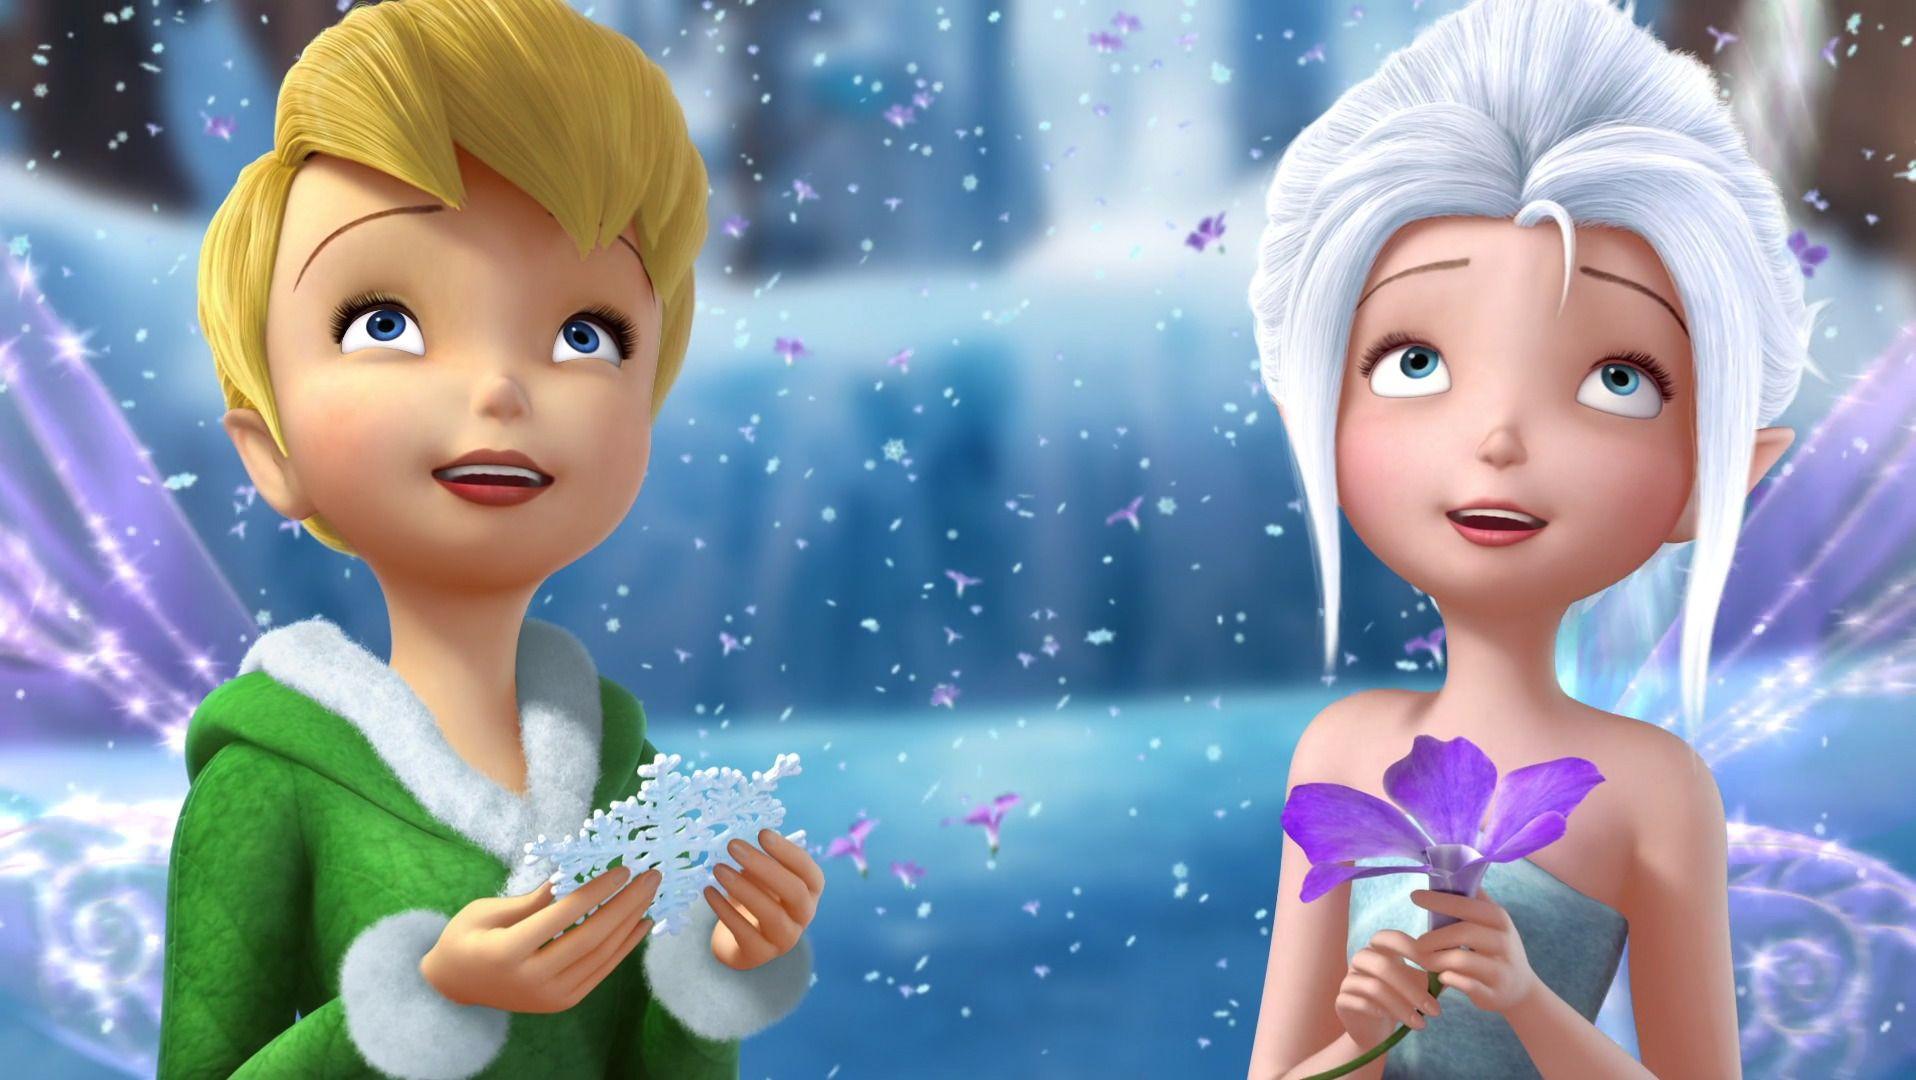 Download Tinkerbell And Periwinkle Wallpaper Widescreen Resolution 9j2q Easyoffer Net Disney Fadas Fadas Disney